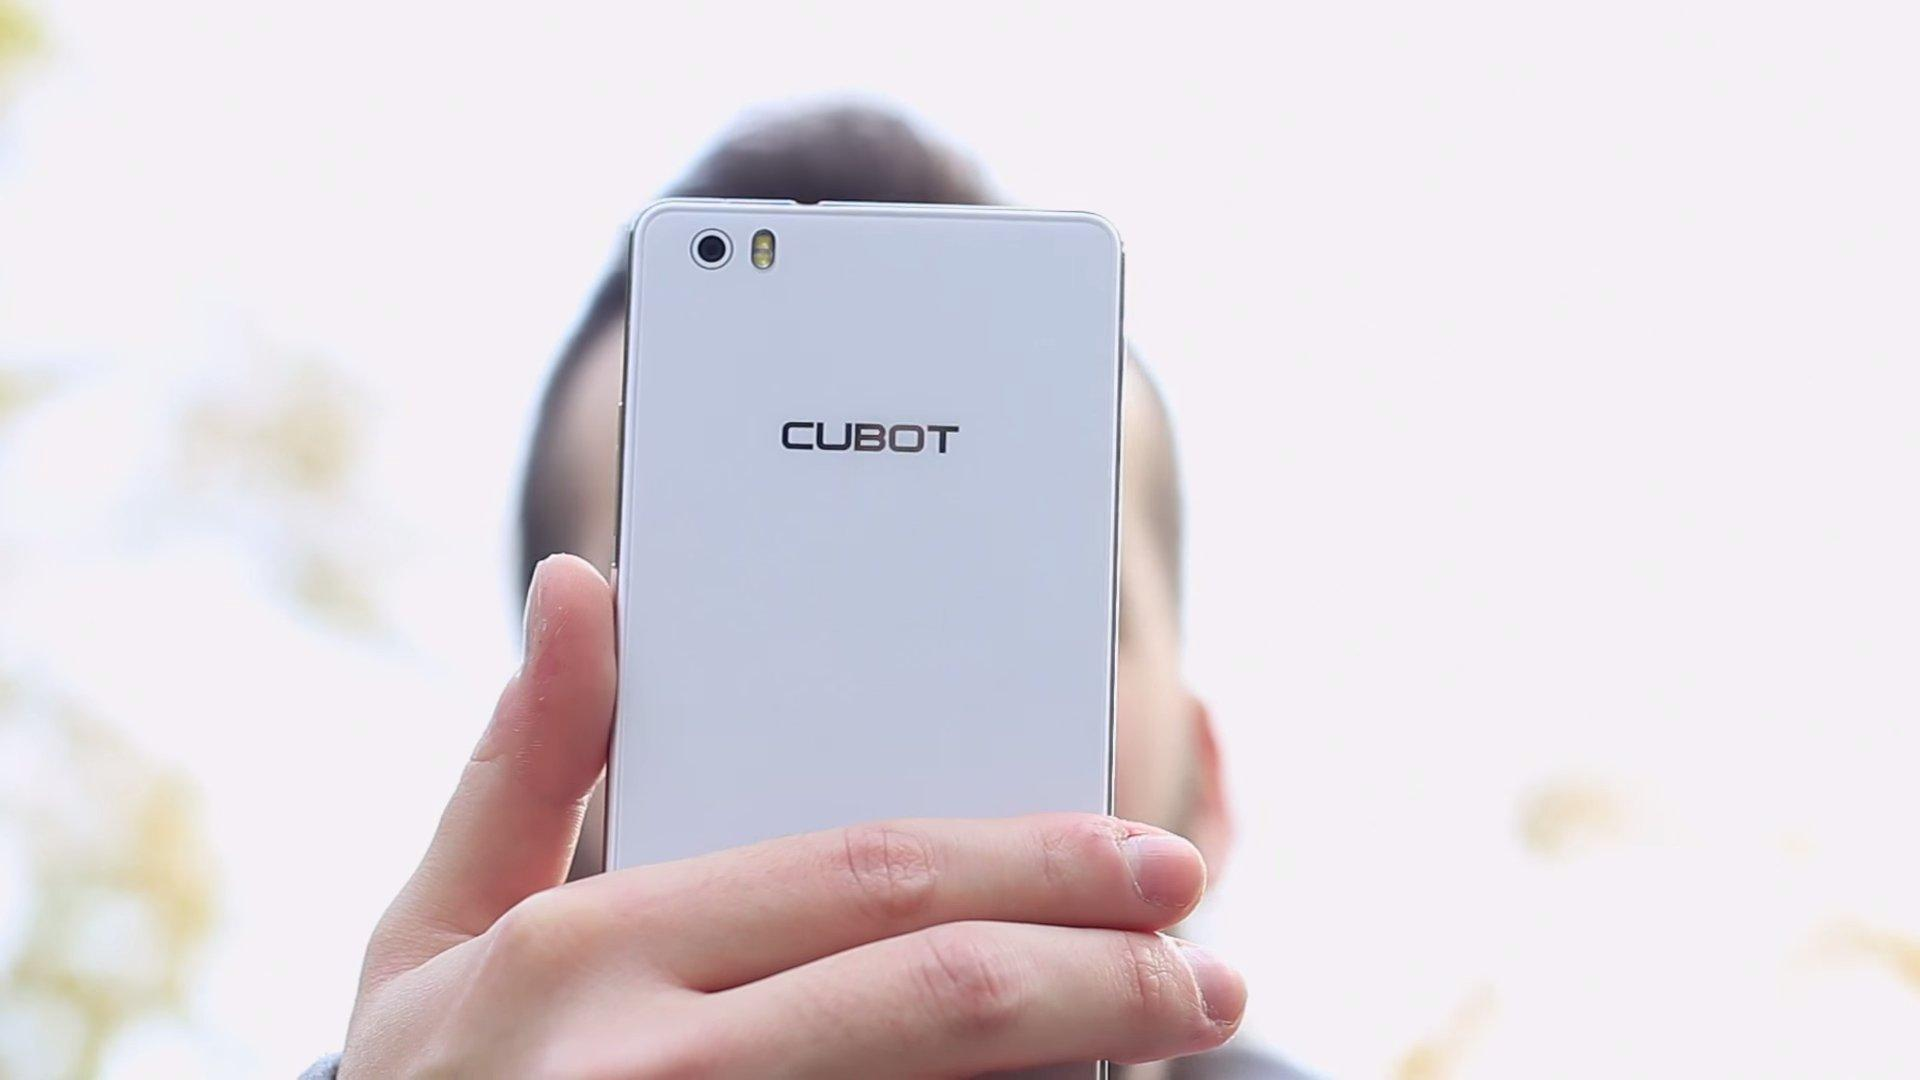 Cubot X16